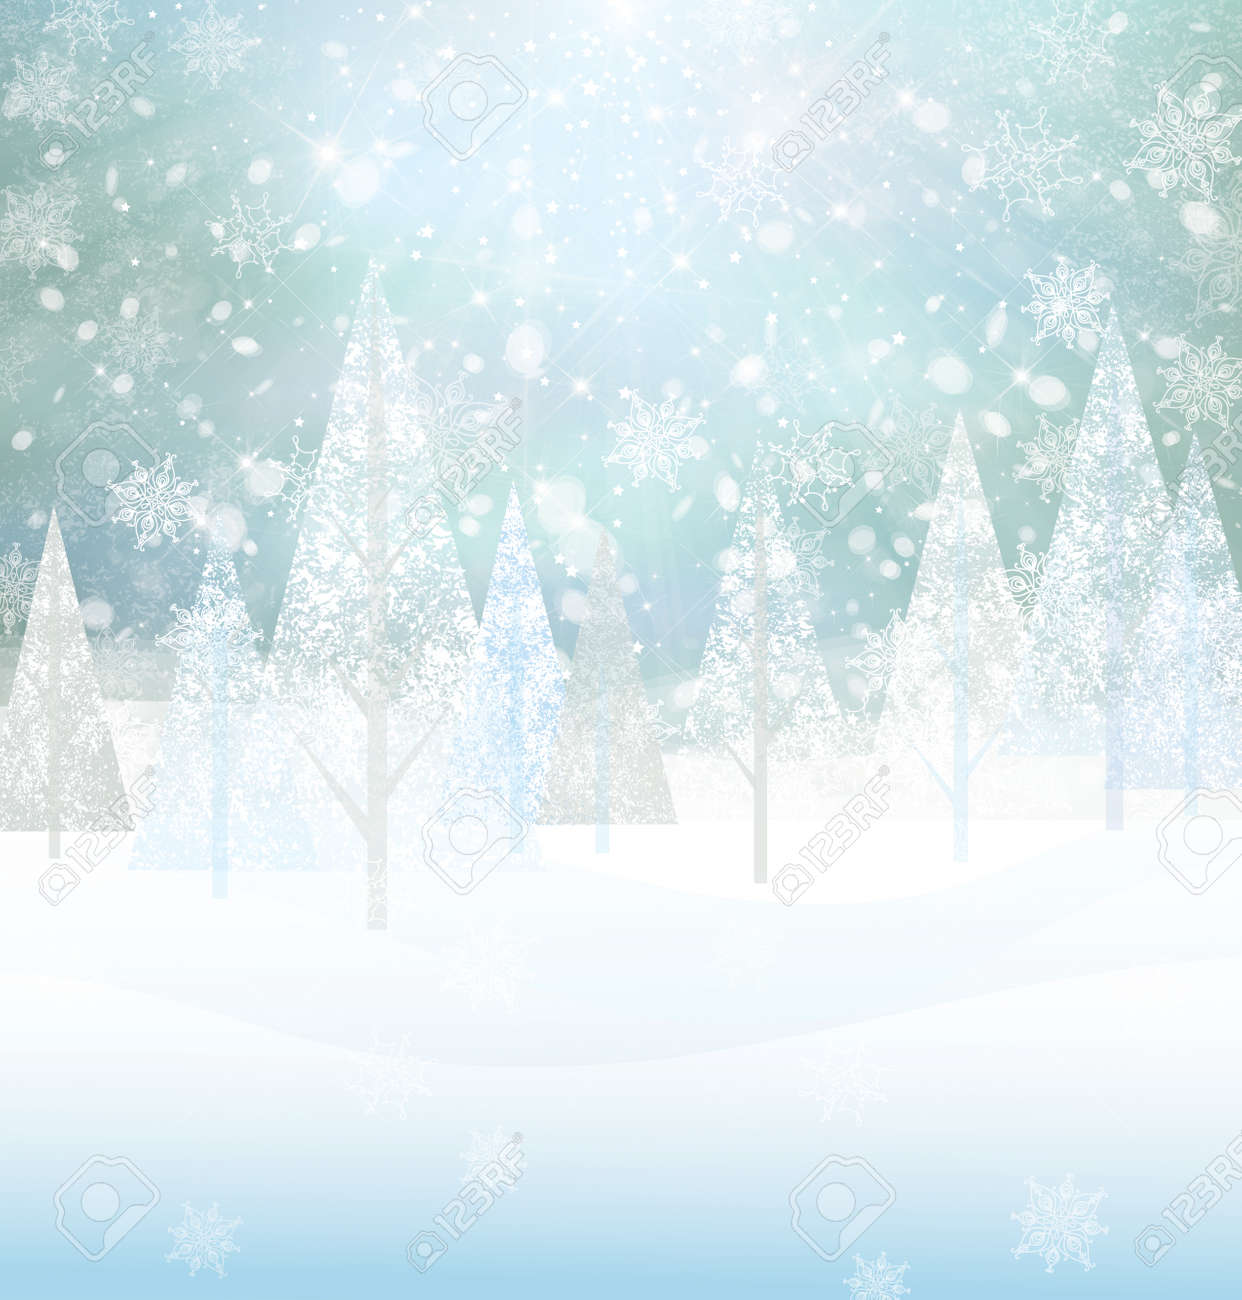 Vector winter snowy background. - 30830384